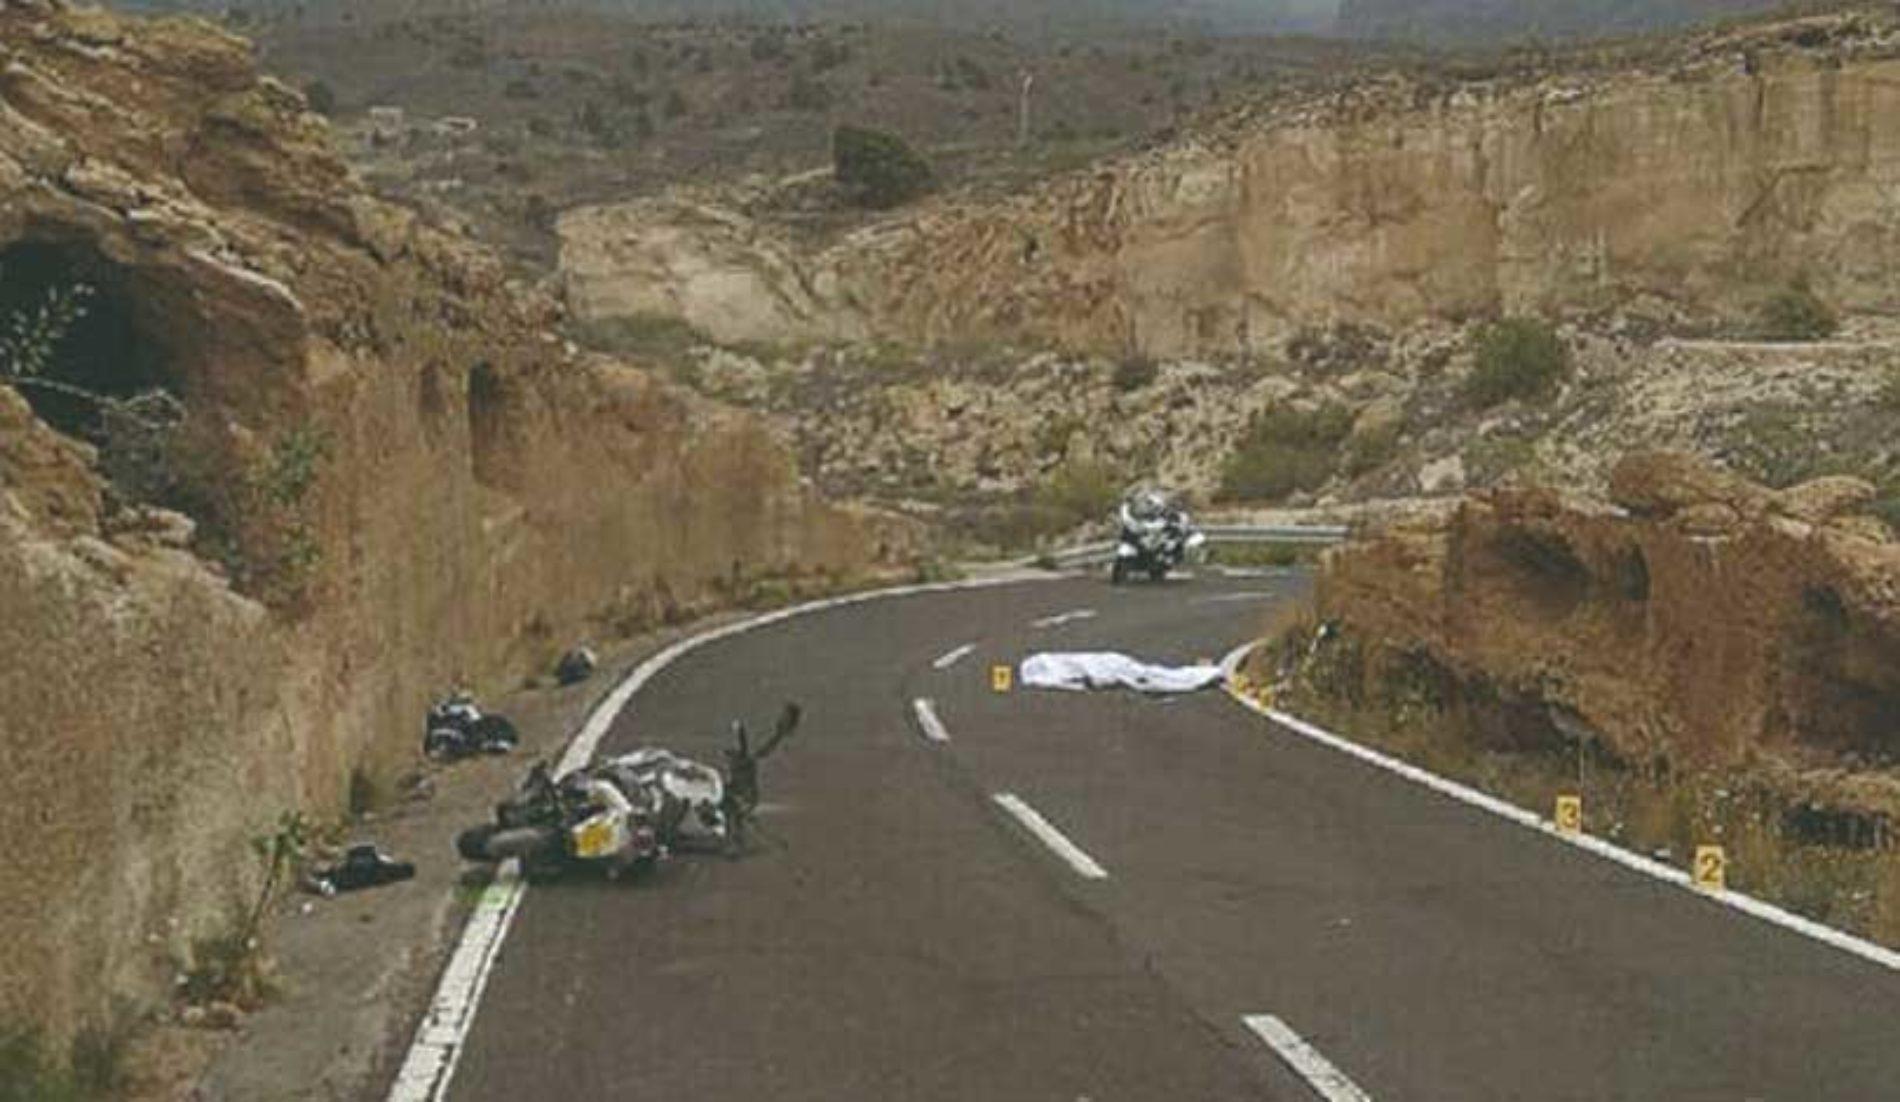 En helg i ulykkenes tegn på Tenerife